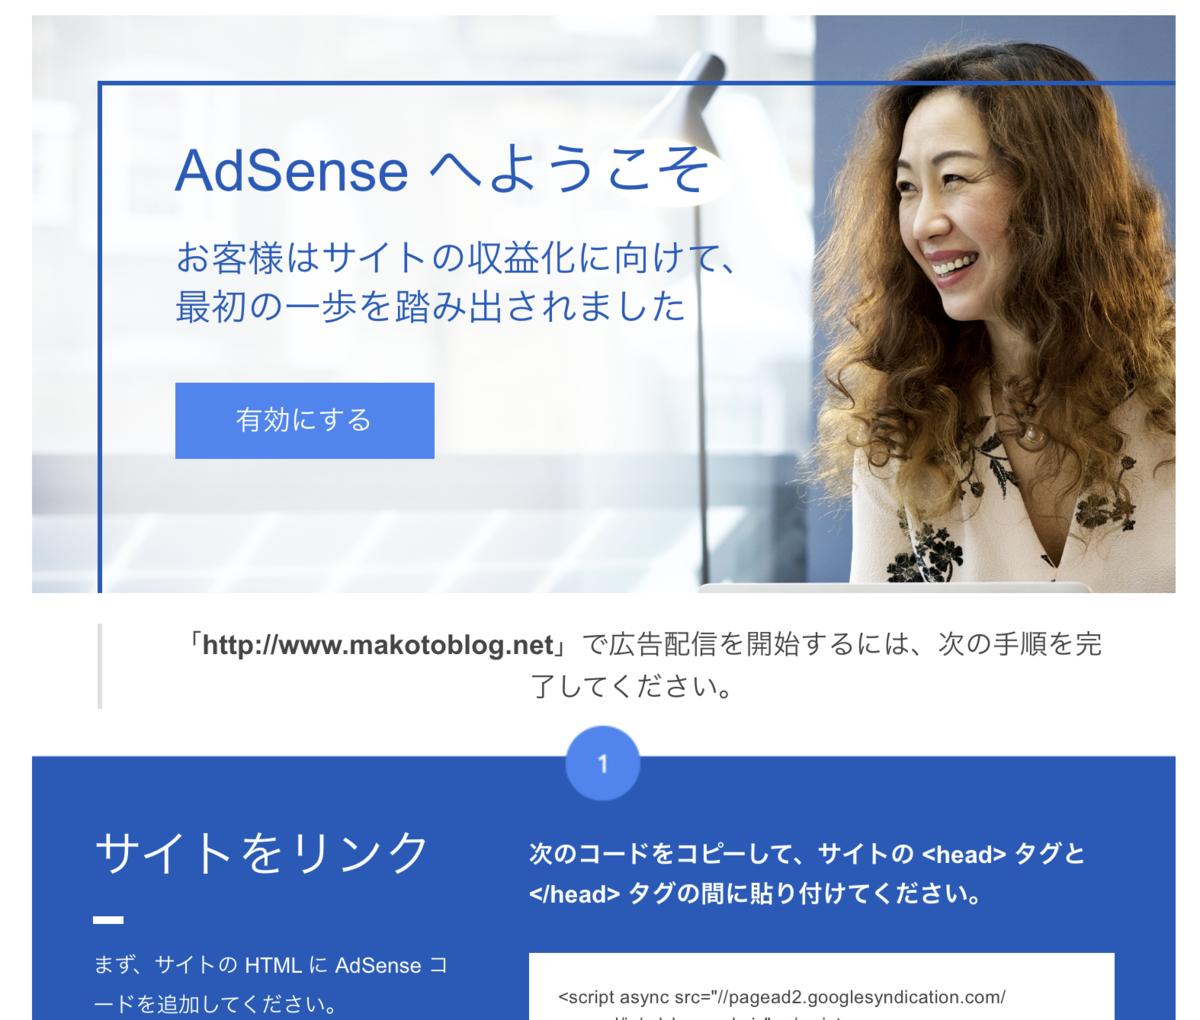 AdSenceへようこそ お客様はサイトの収益化に向けて、最初の一歩を踏み出されました